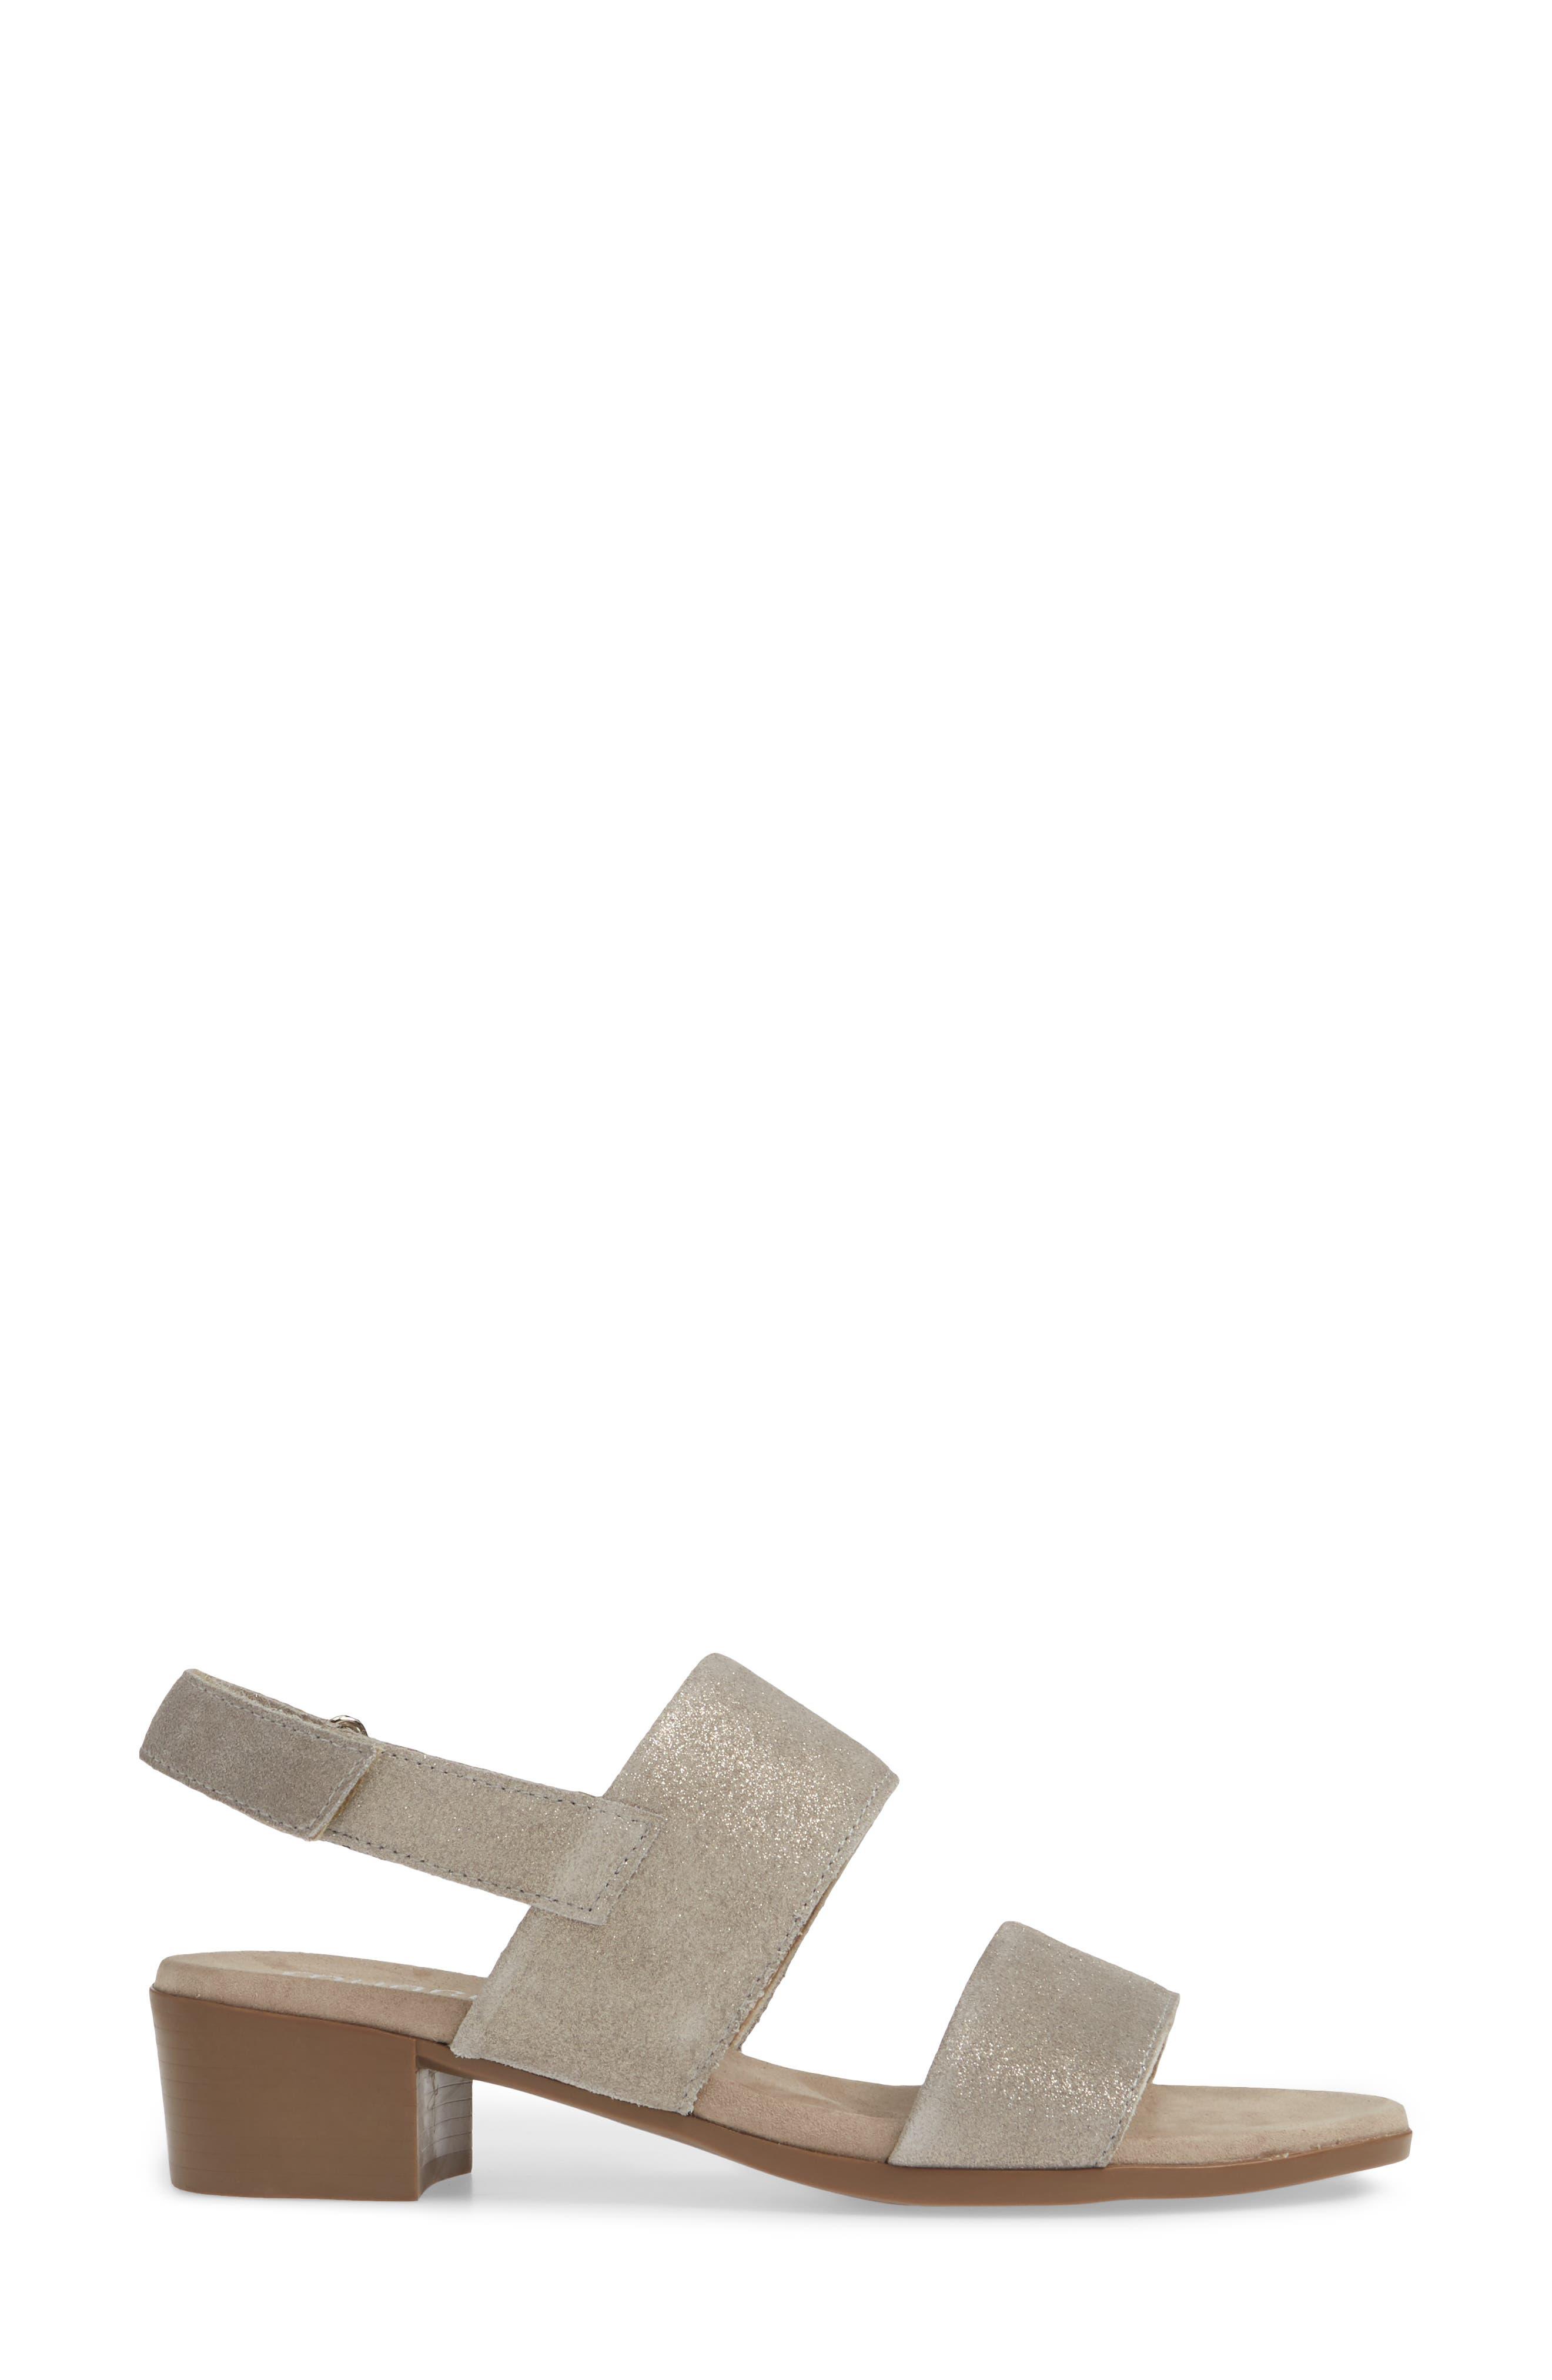 MUNRO, Kristal Sandal, Alternate thumbnail 3, color, CHAMPAGNE SHIMMER SUEDE